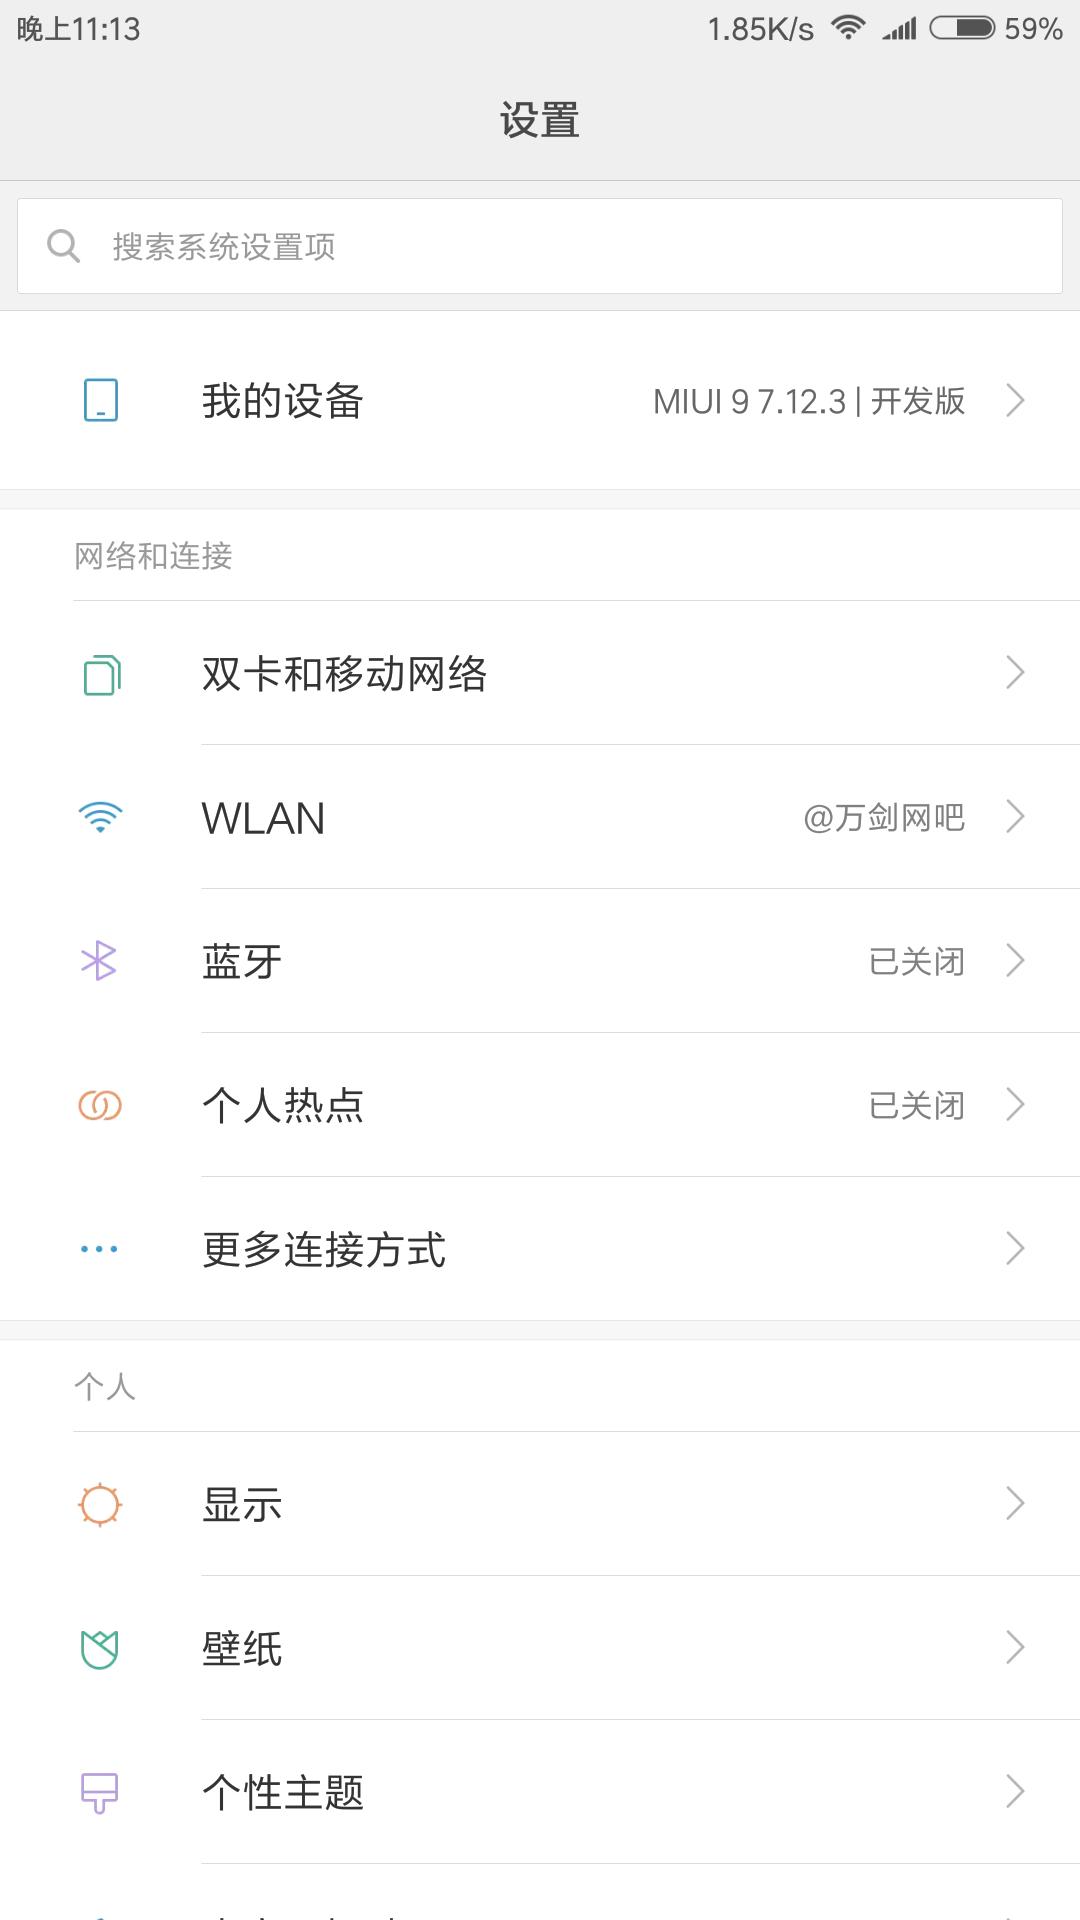 Screenshot_2017-12-03-23-13-22-226_com.android.settings.png